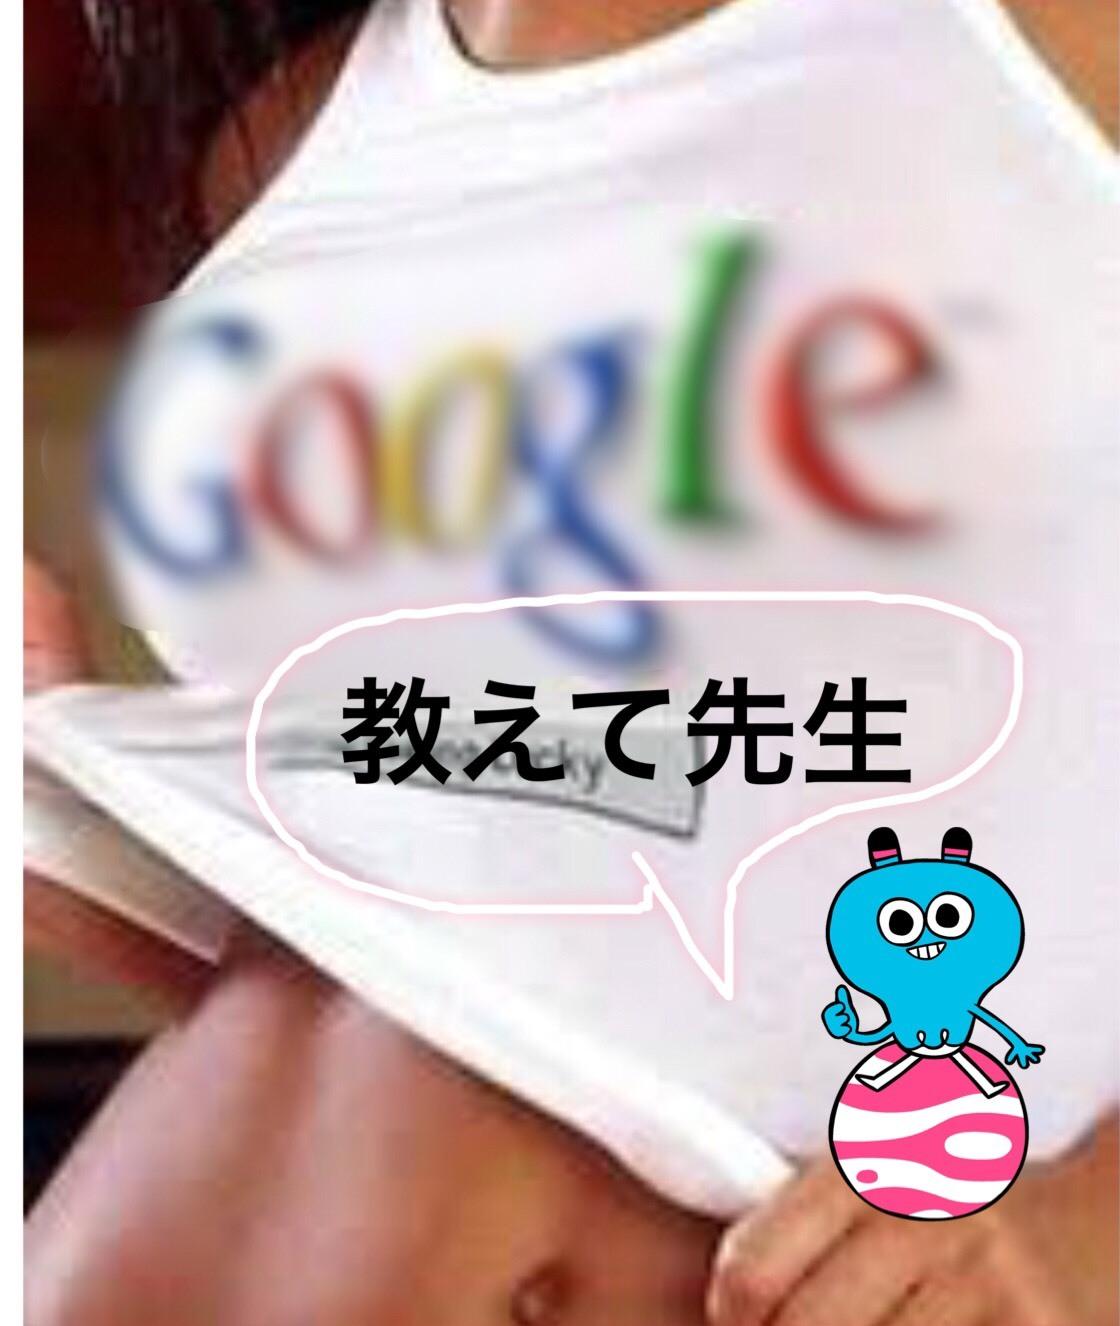 S__34471948.jpg